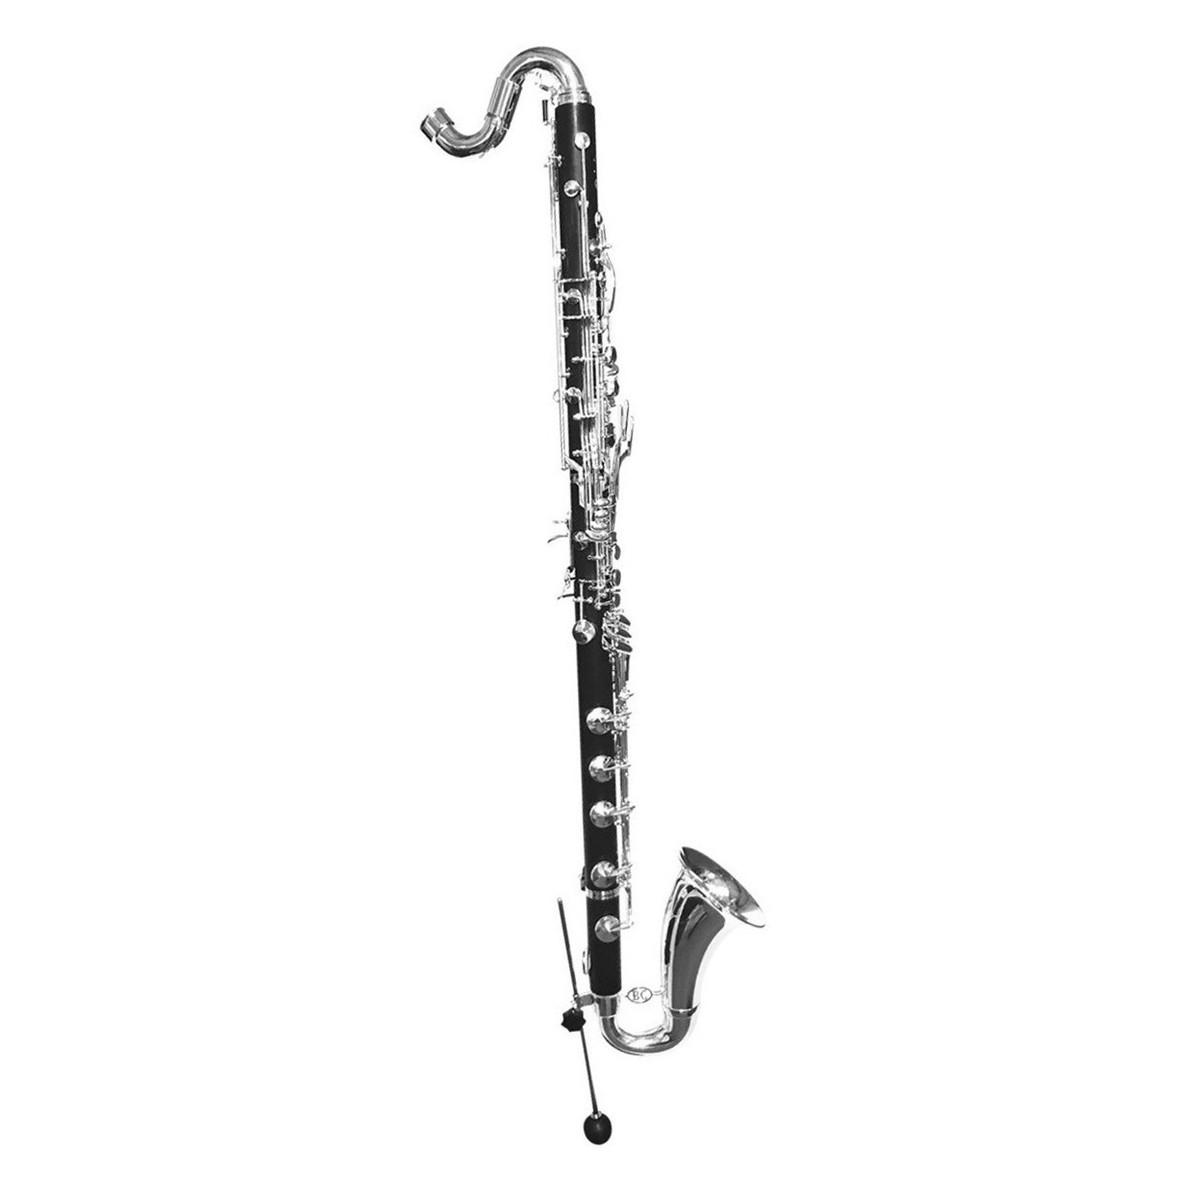 buffet prestige bass clarinet low d to low c extension at gear4music rh gear4music com